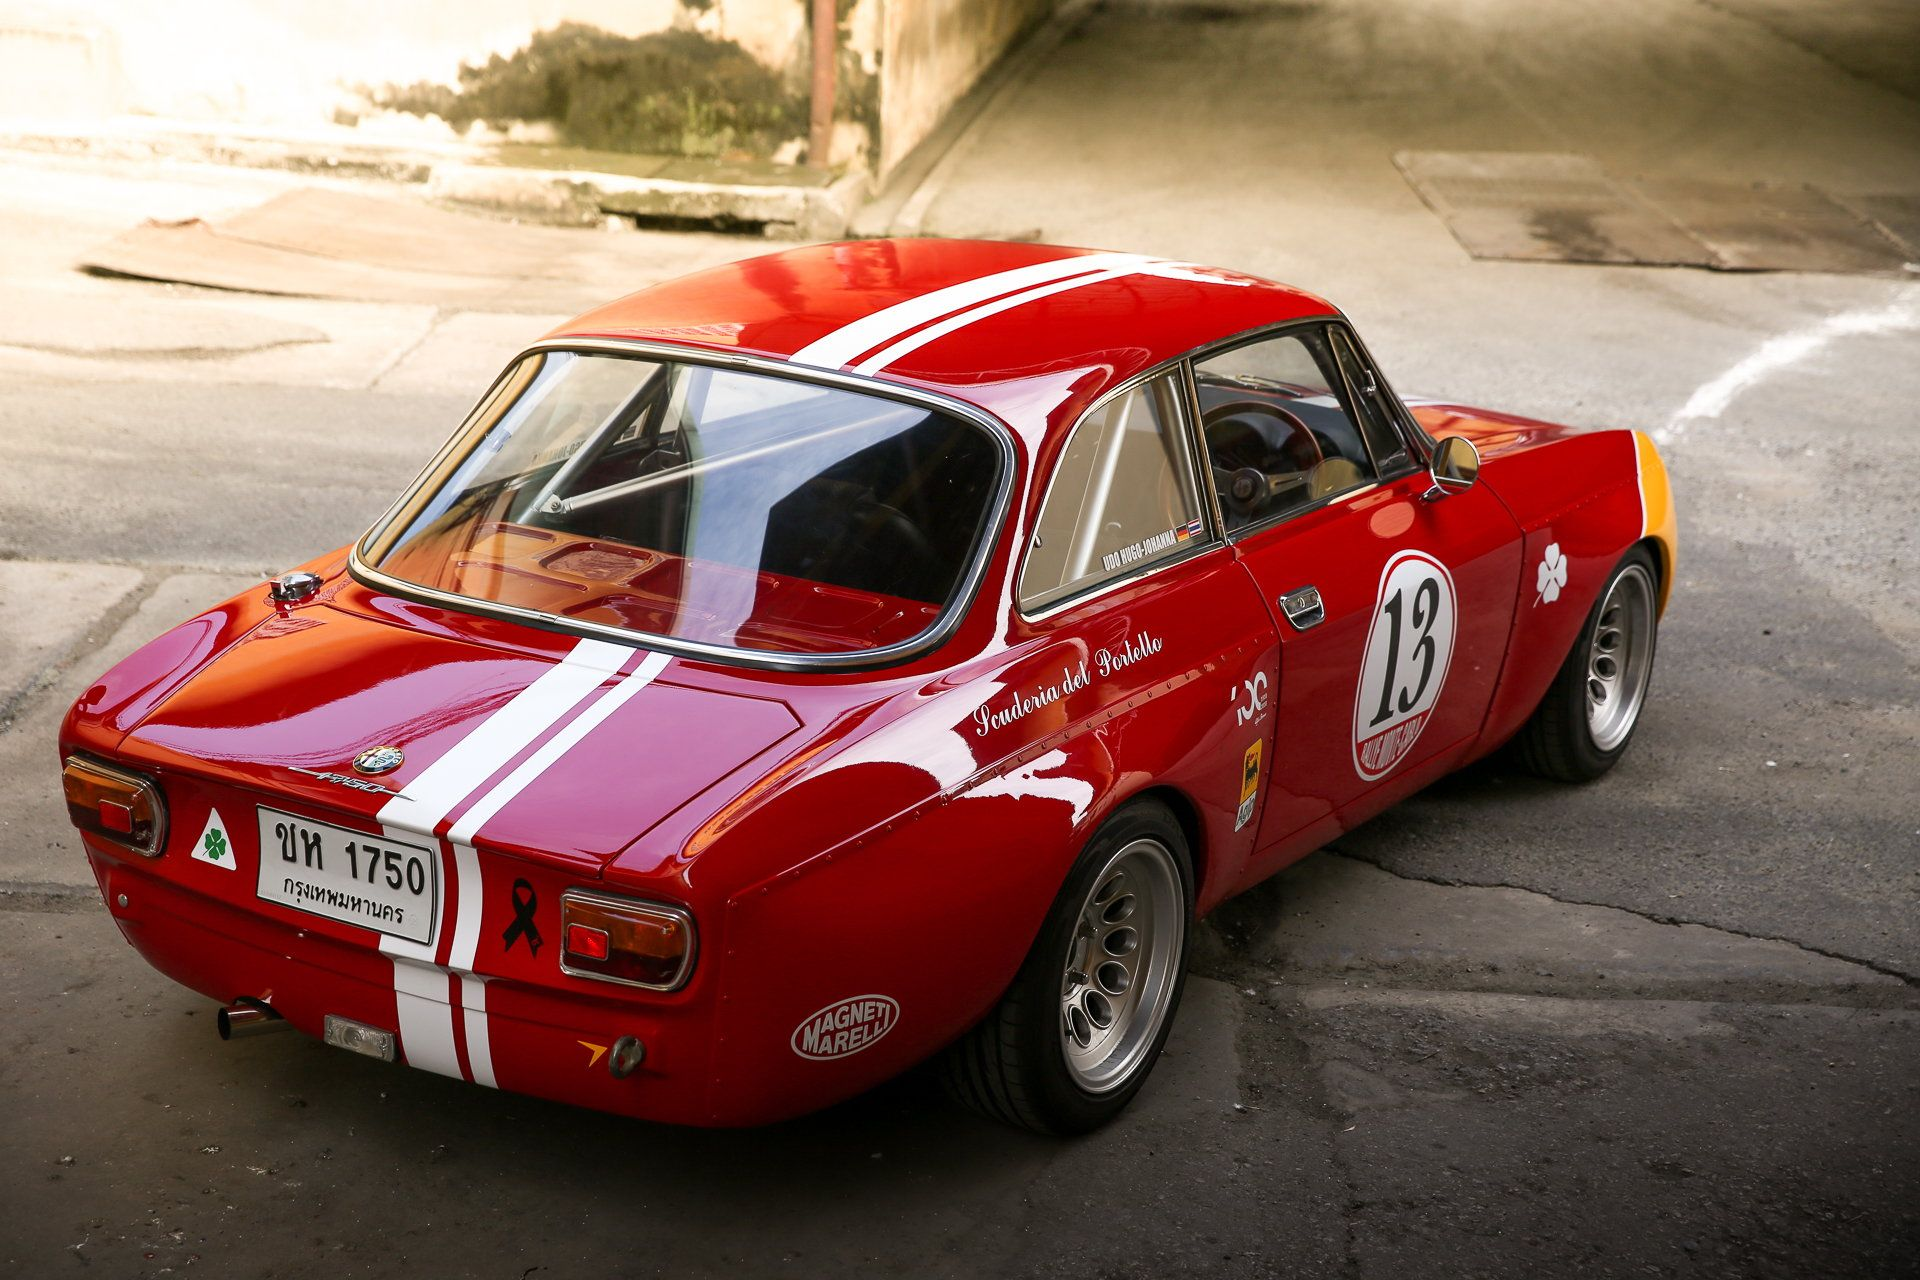 d6c6434d625fb4926324e60e8d5ef51b Marvelous Ferrari Mondial 8 Te Koop Cars Trend